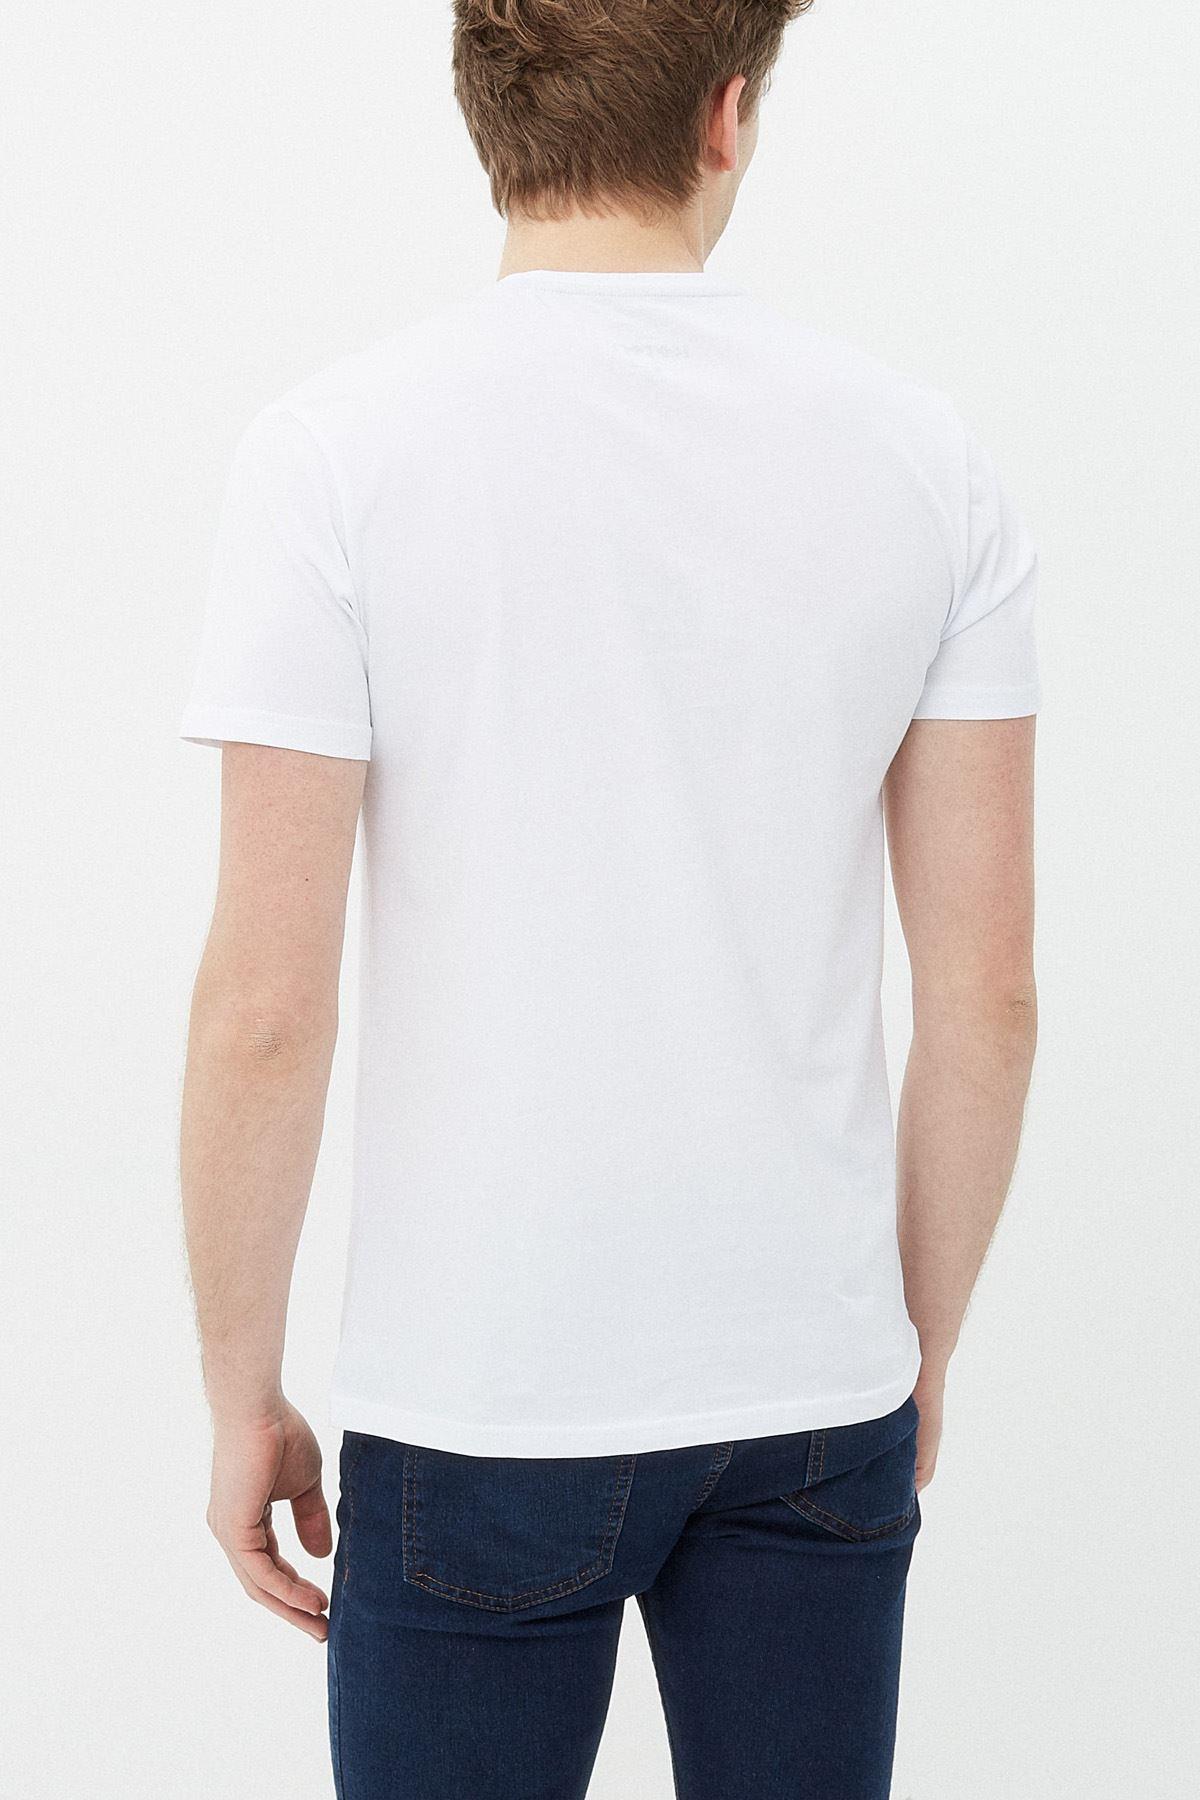 Anime Death Note Beyaz Erkek Tshirt - Tişört